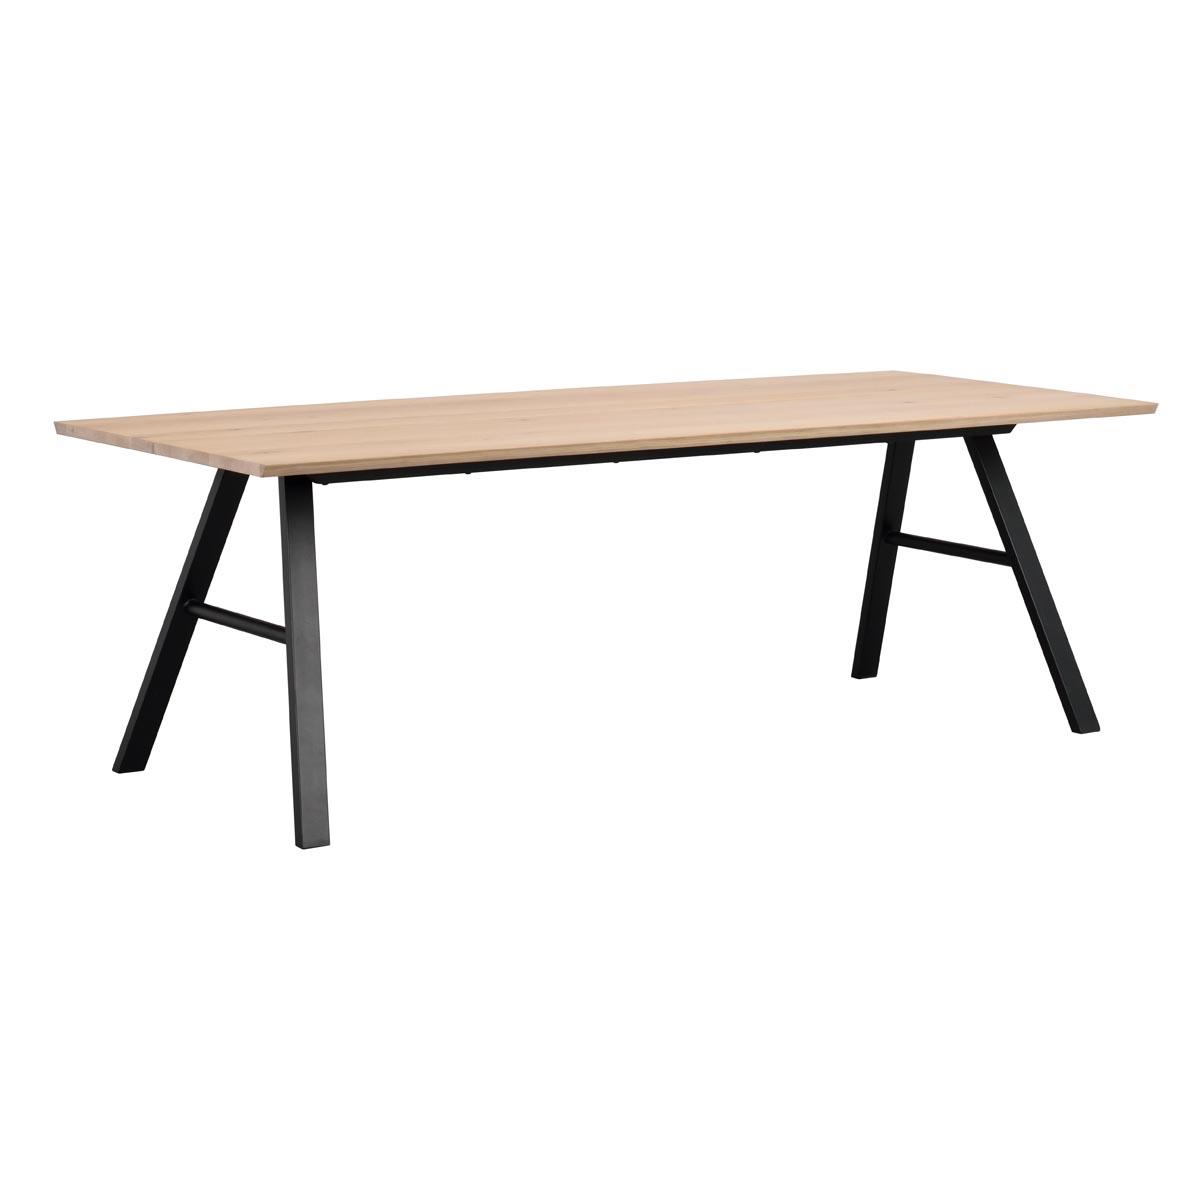 Brigham-matbord-vitpigm-vildek_svartR -119400_b